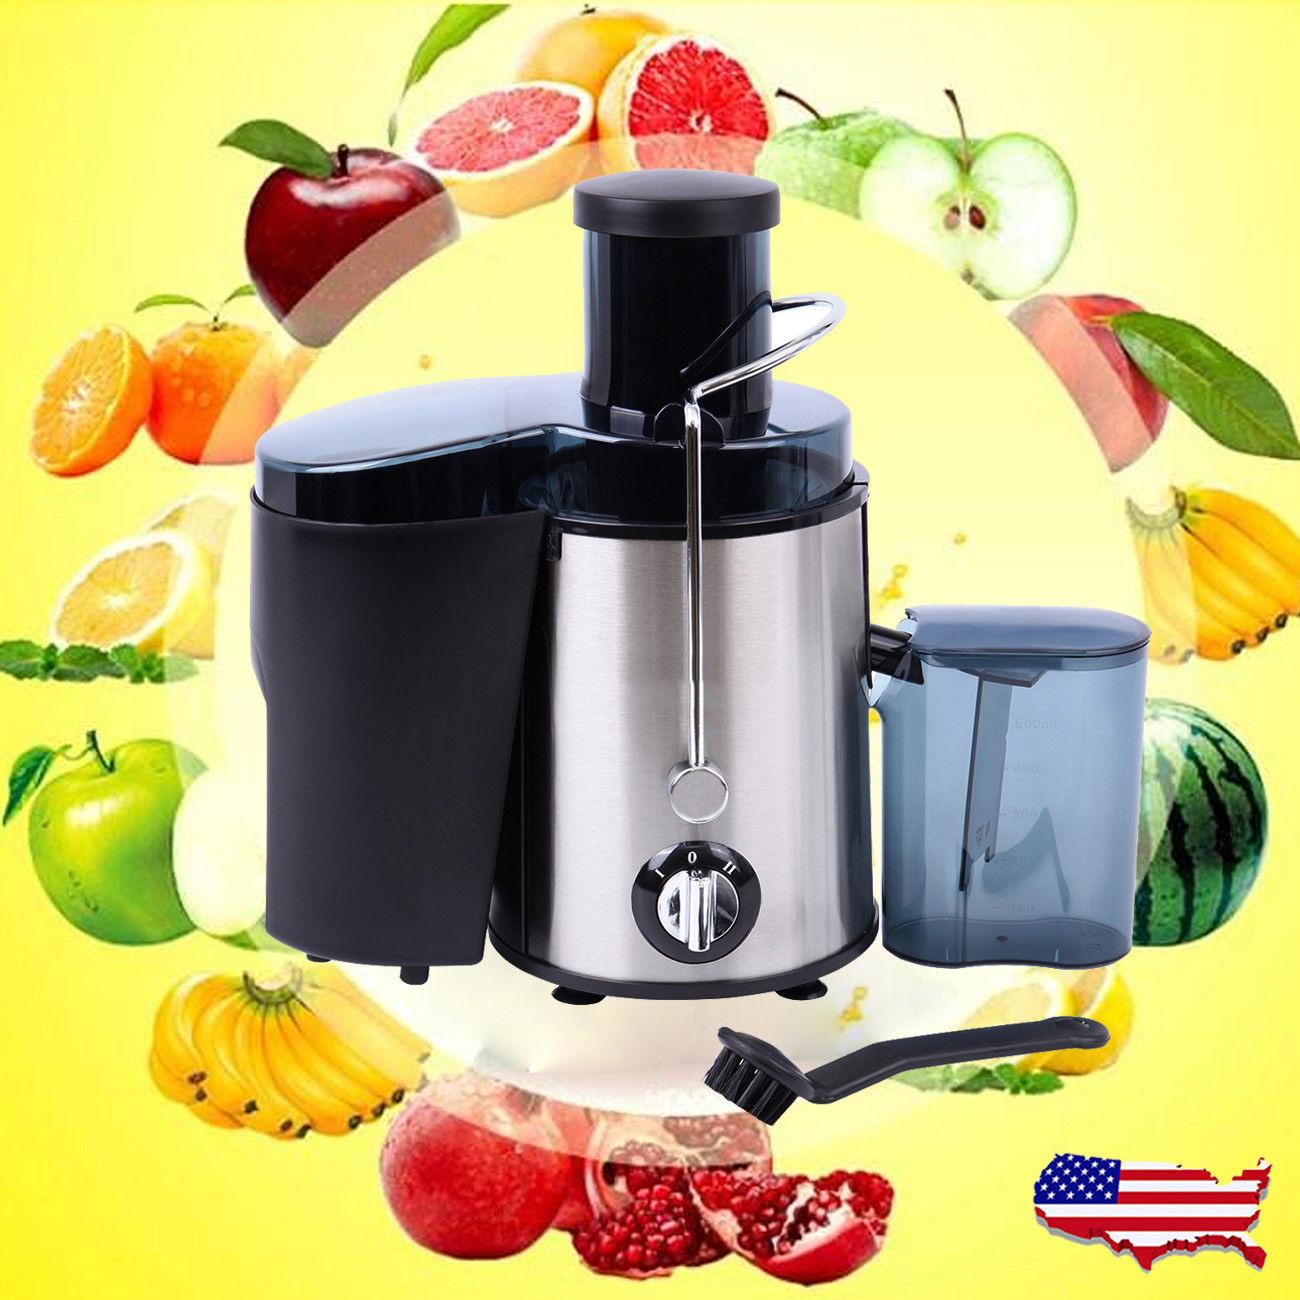 800w Electric Fruit Vegetable Juicer Extractor Juice Maker